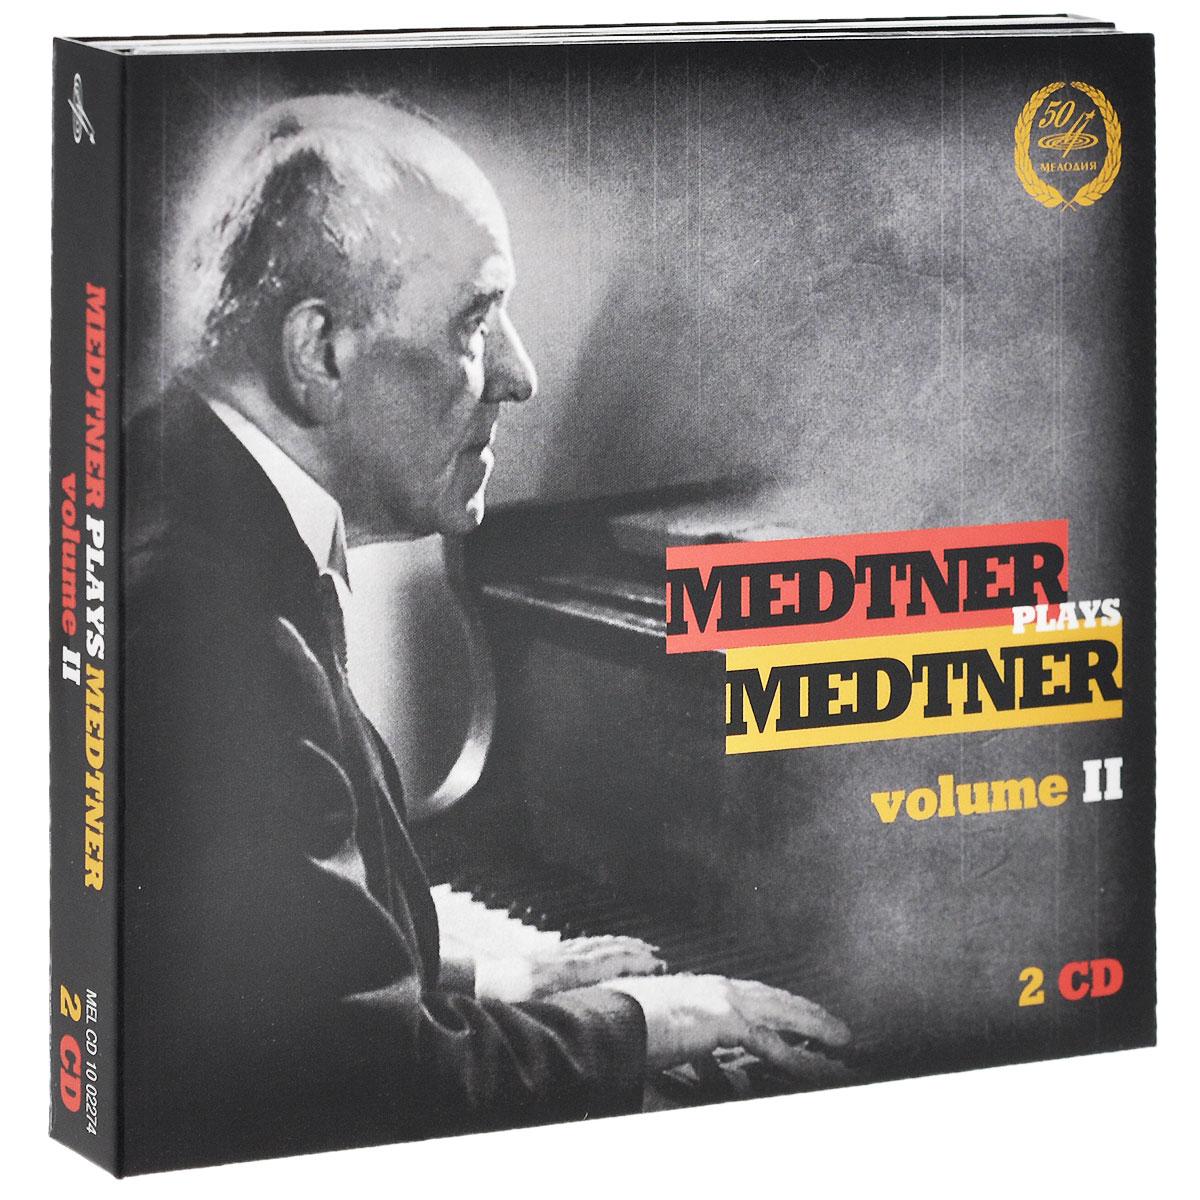 Николай Метнер,Orchestre Philharmonia de Londres,George Welldon,Иссей Добровен Medtner Plays Medtner Volume II (2 CD) four major plays volume i